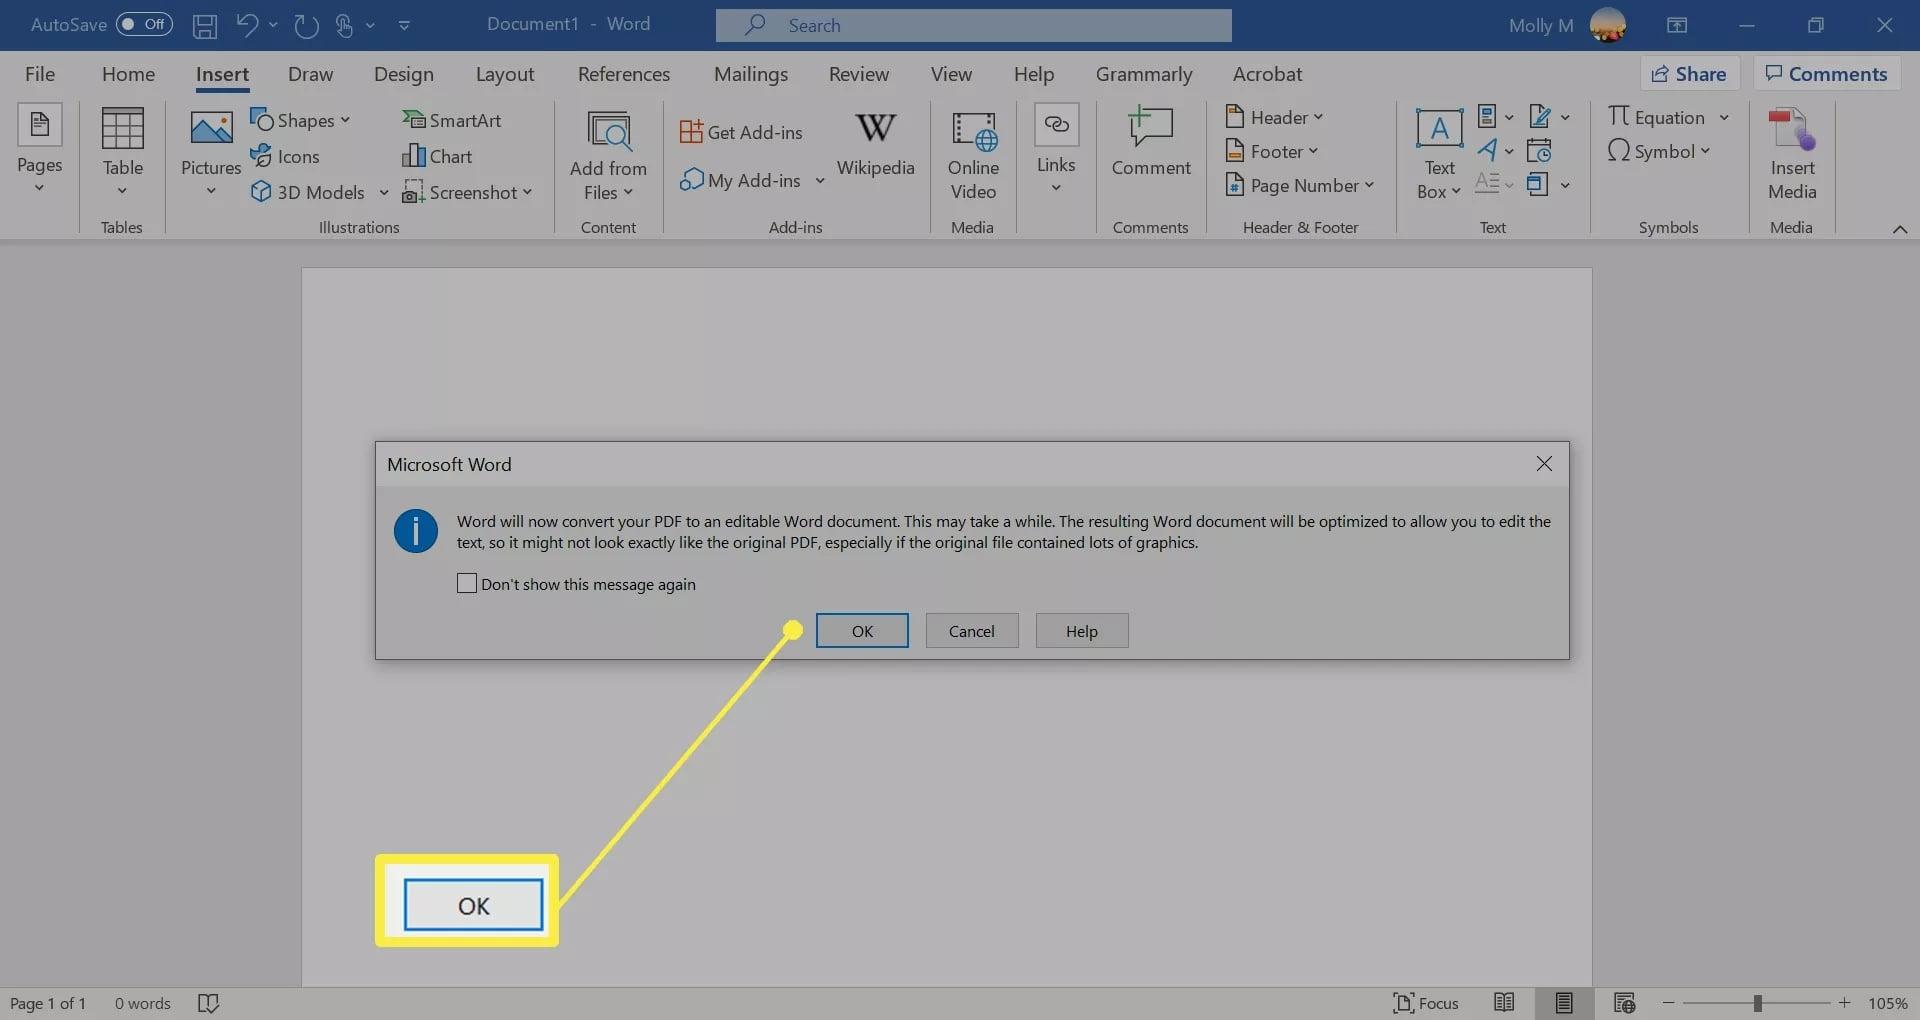 microsoft word converting pdf